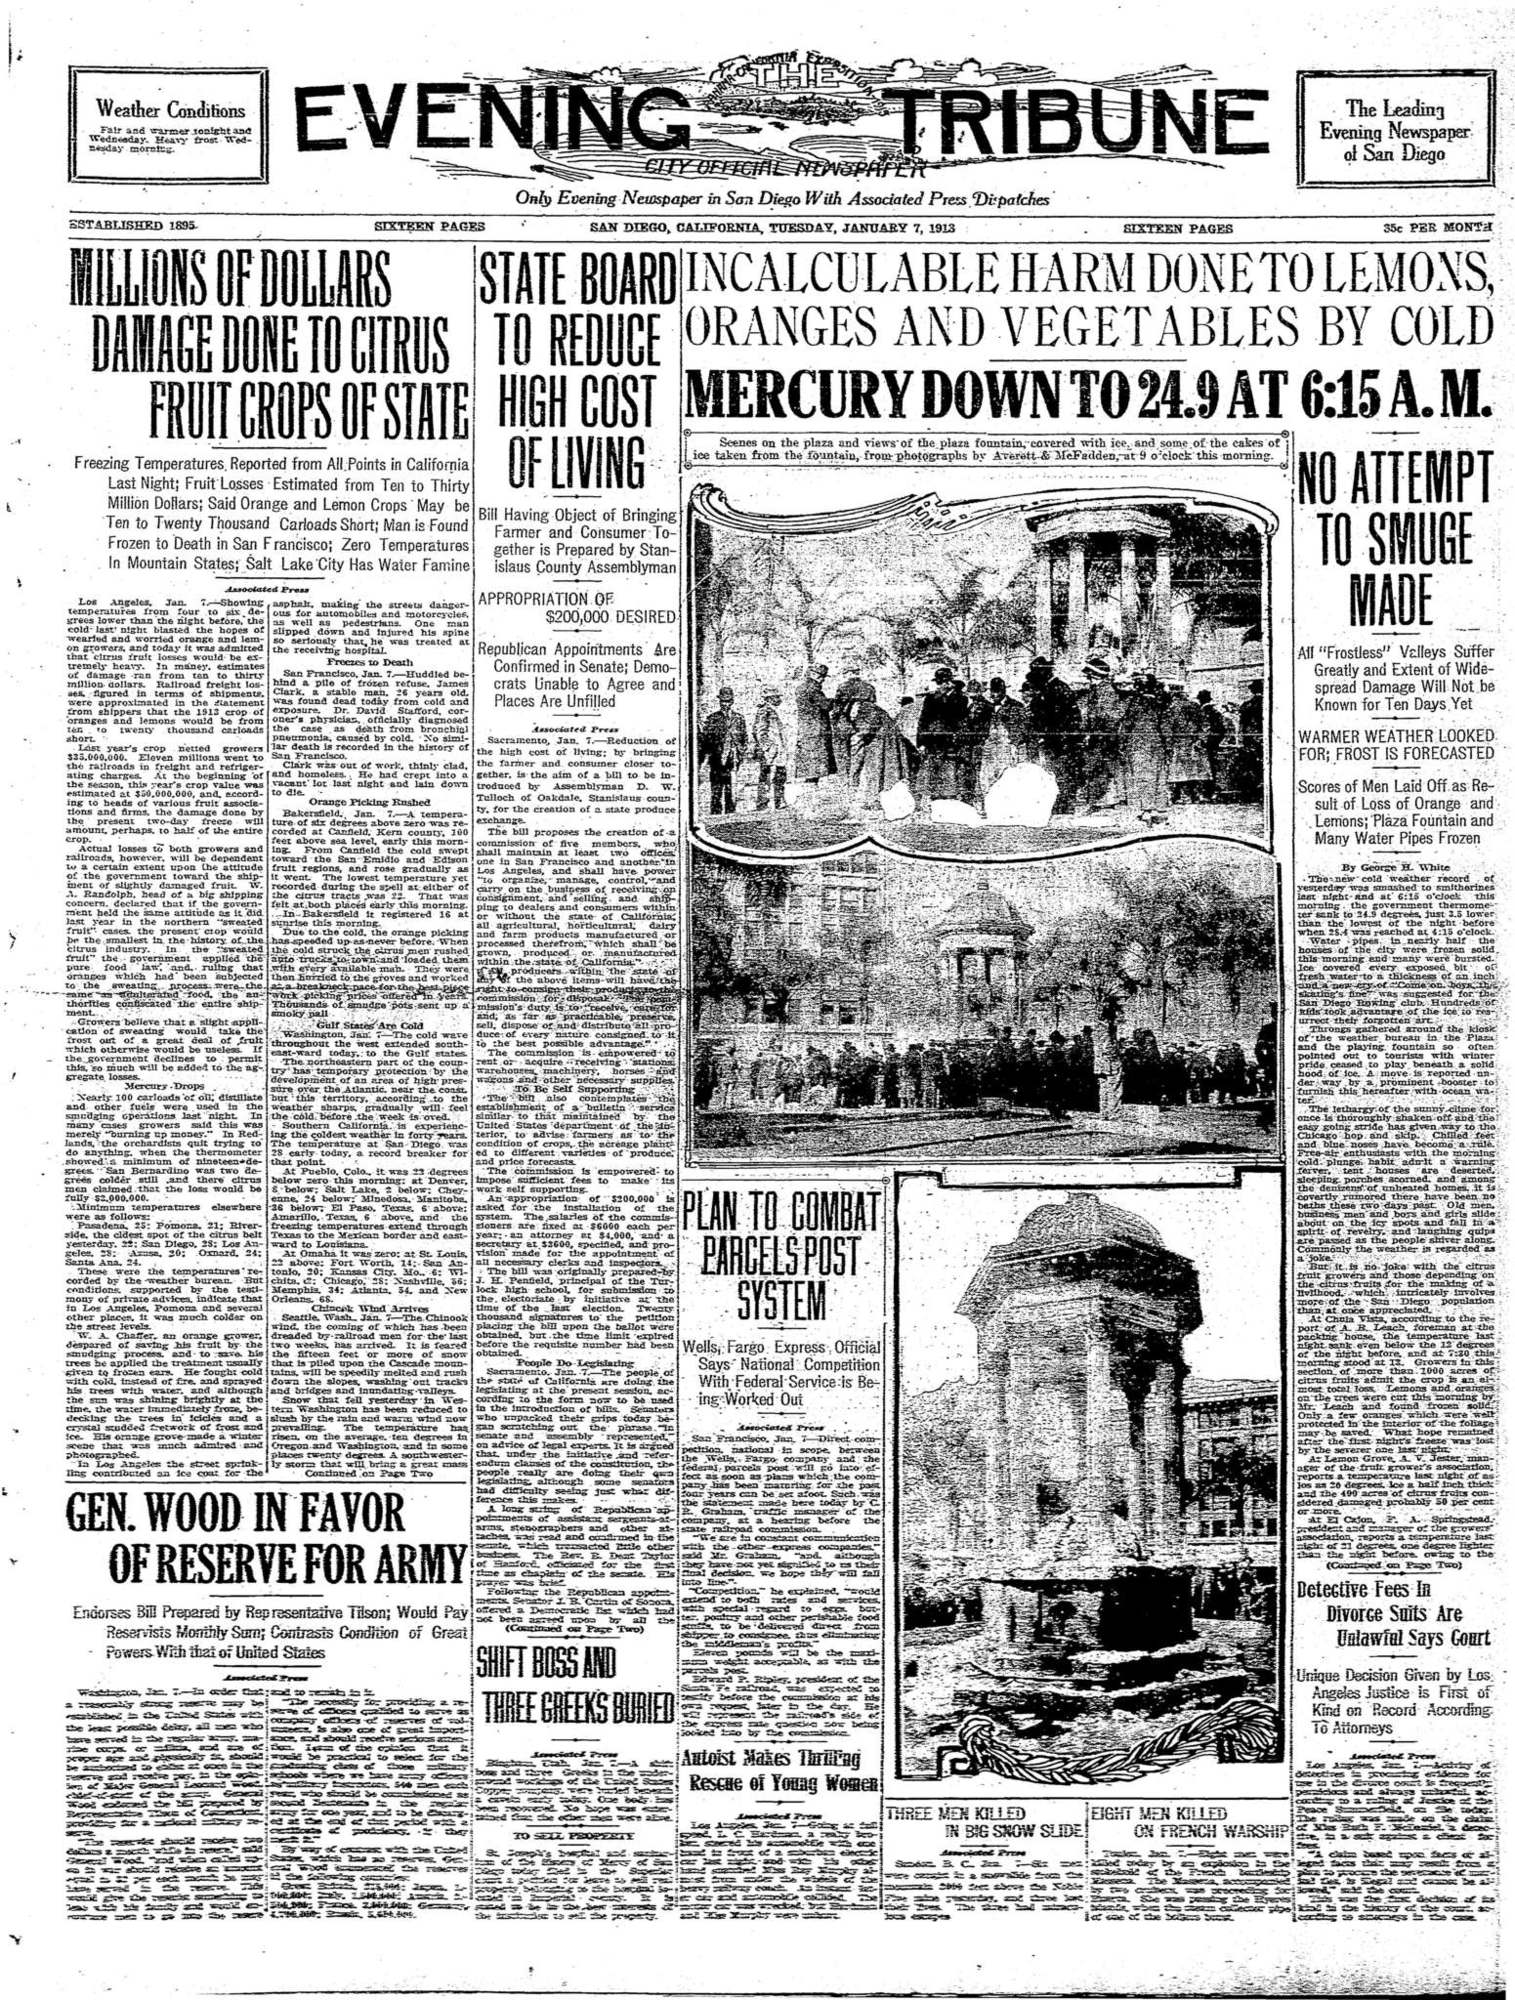 January 7, 1913